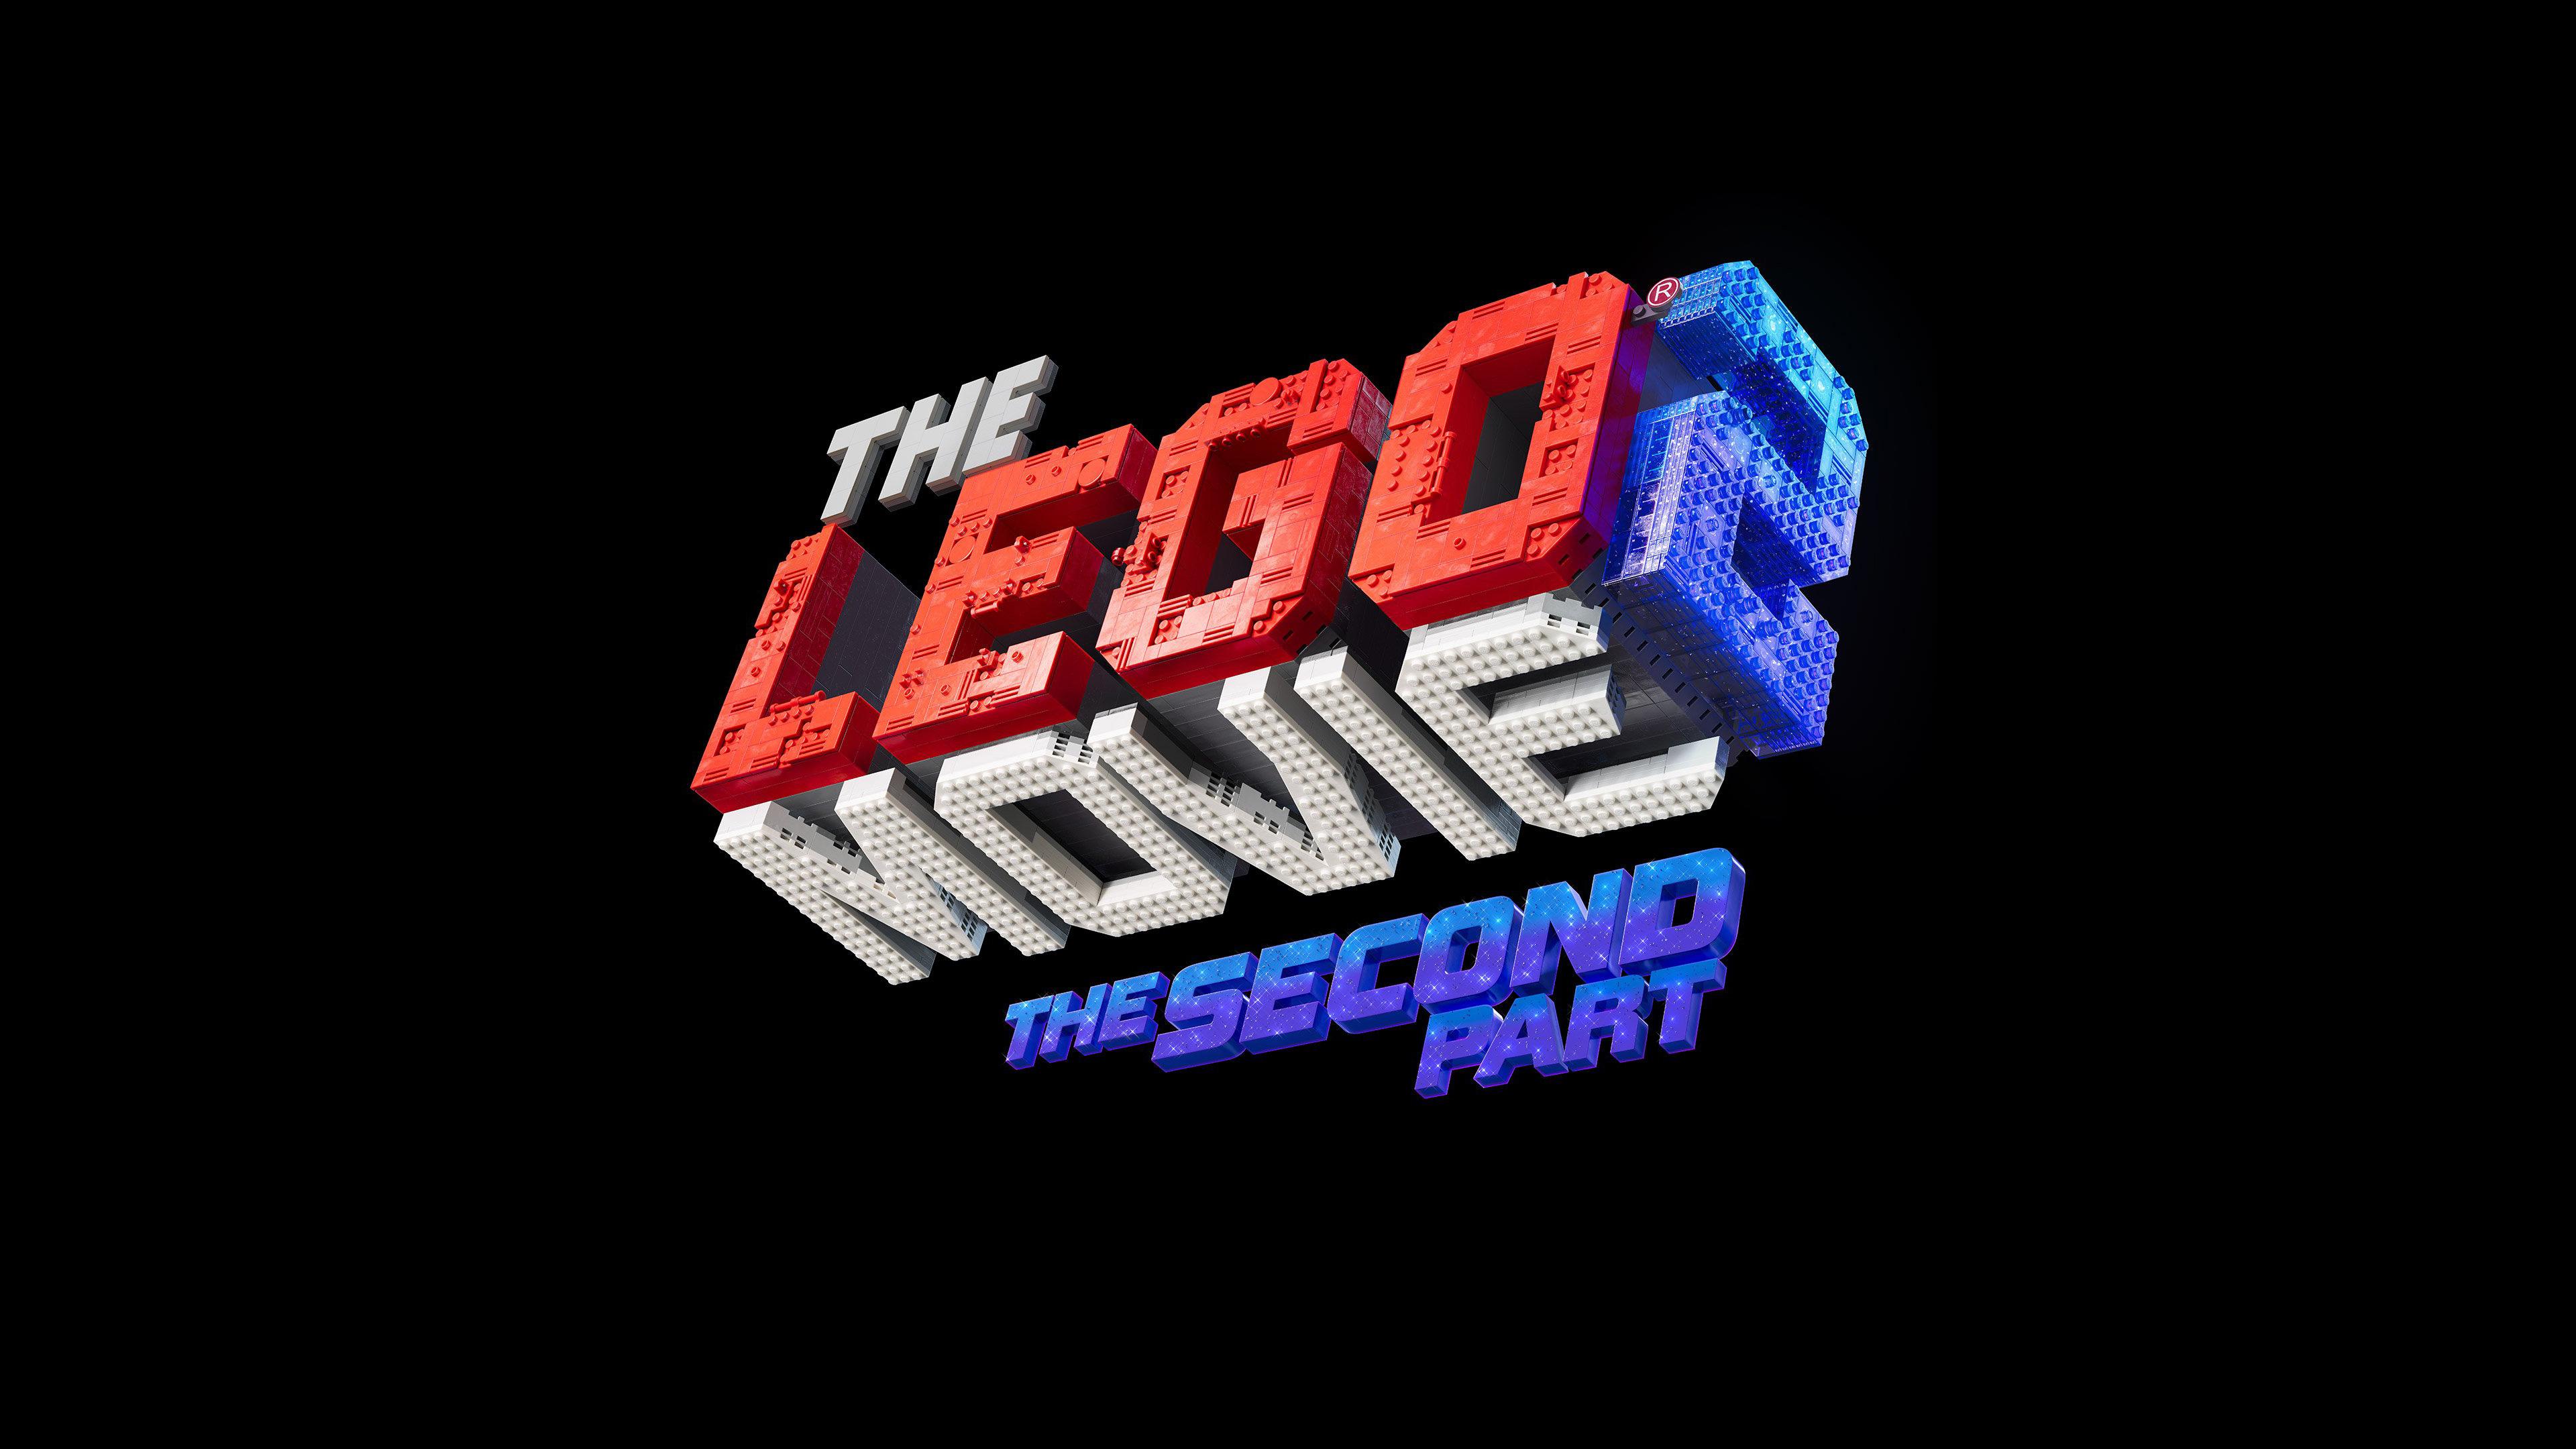 The LEGO Movie 2 wallpaper.jpg